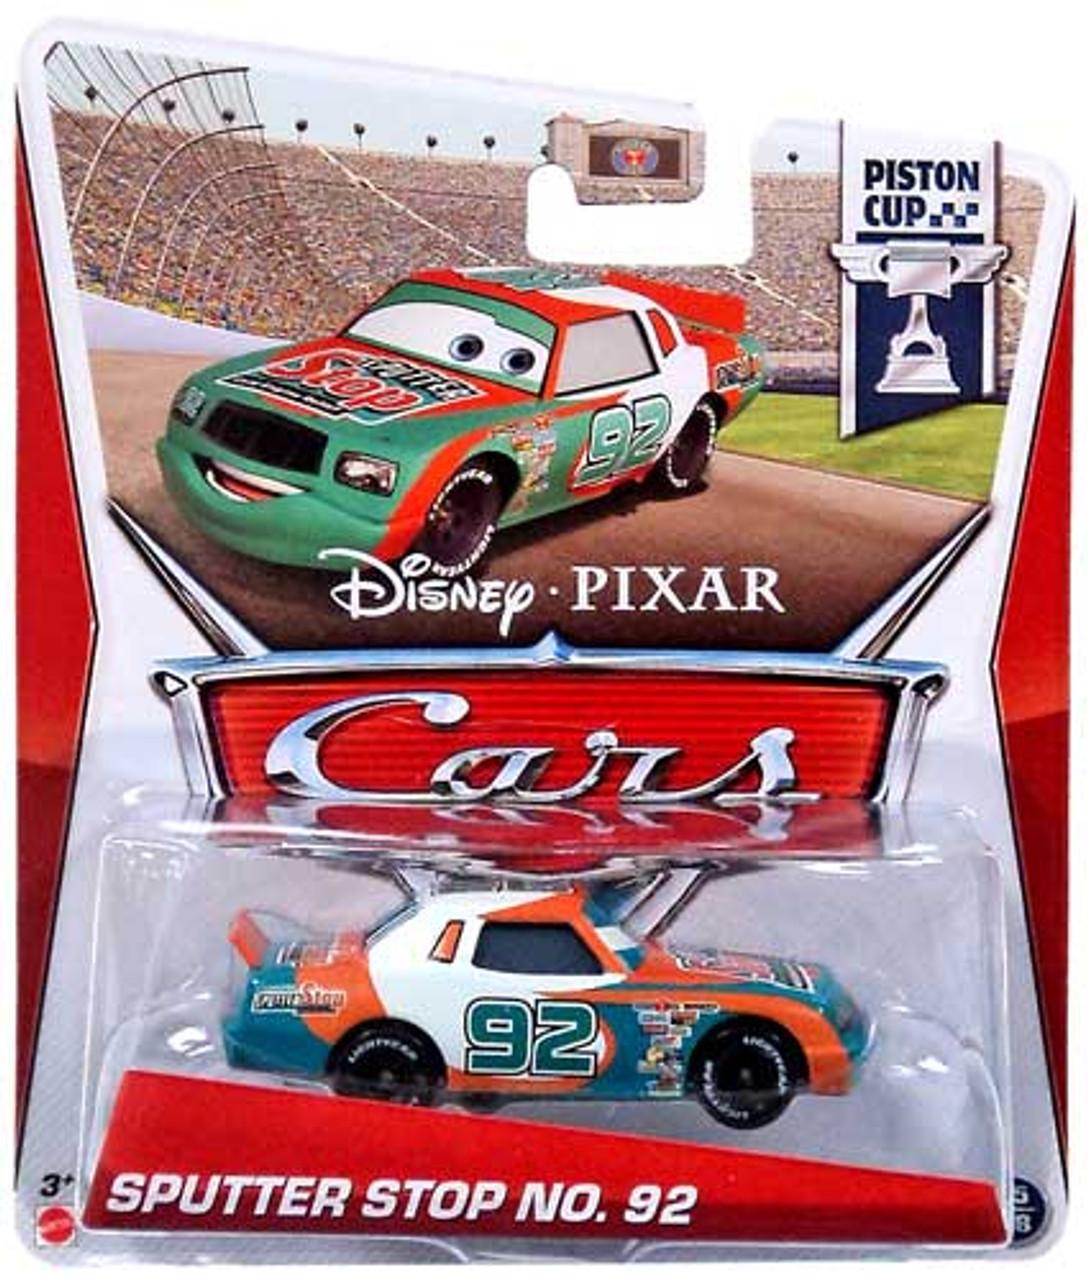 Disney Cars Series 3 Sputter Stop No. 92 Diecast Car